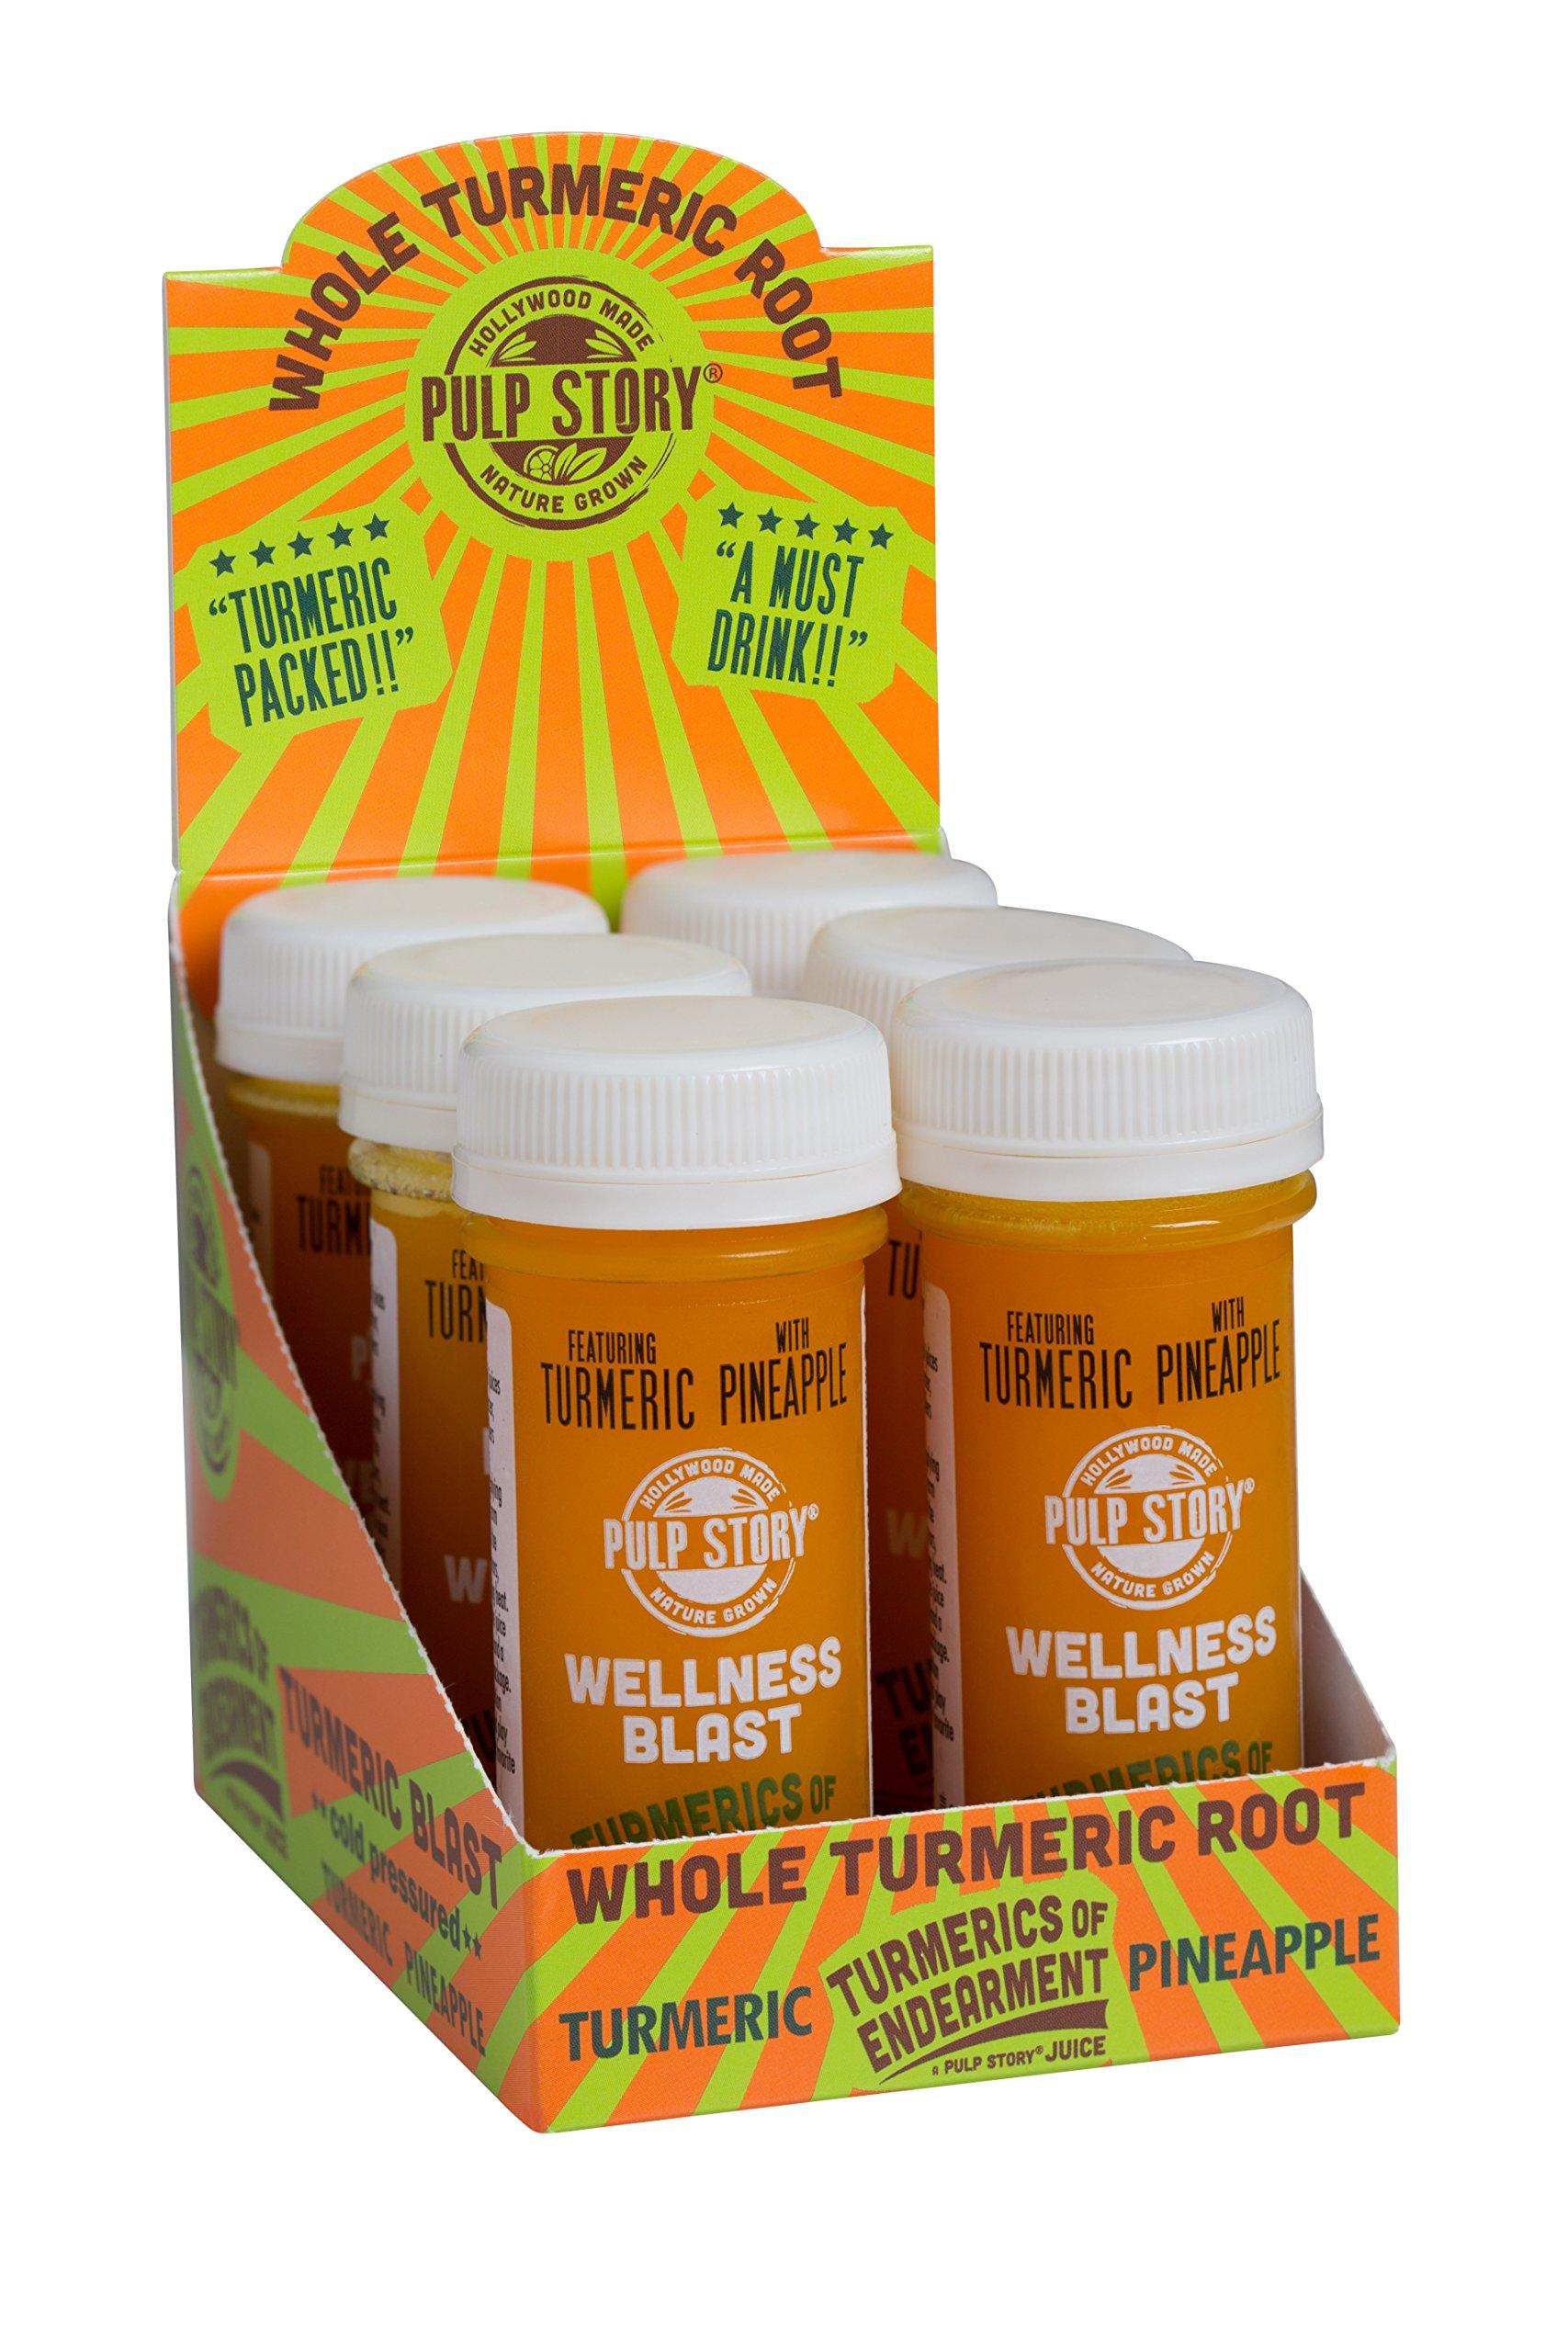 Cold Pressed Juice Shots - Pineapple & Turmeric Juice - Organic Health & Wellness Blast - Turmerics Of Endearment - 2 Oz Single Servings, 6 Count - By Pulp Story